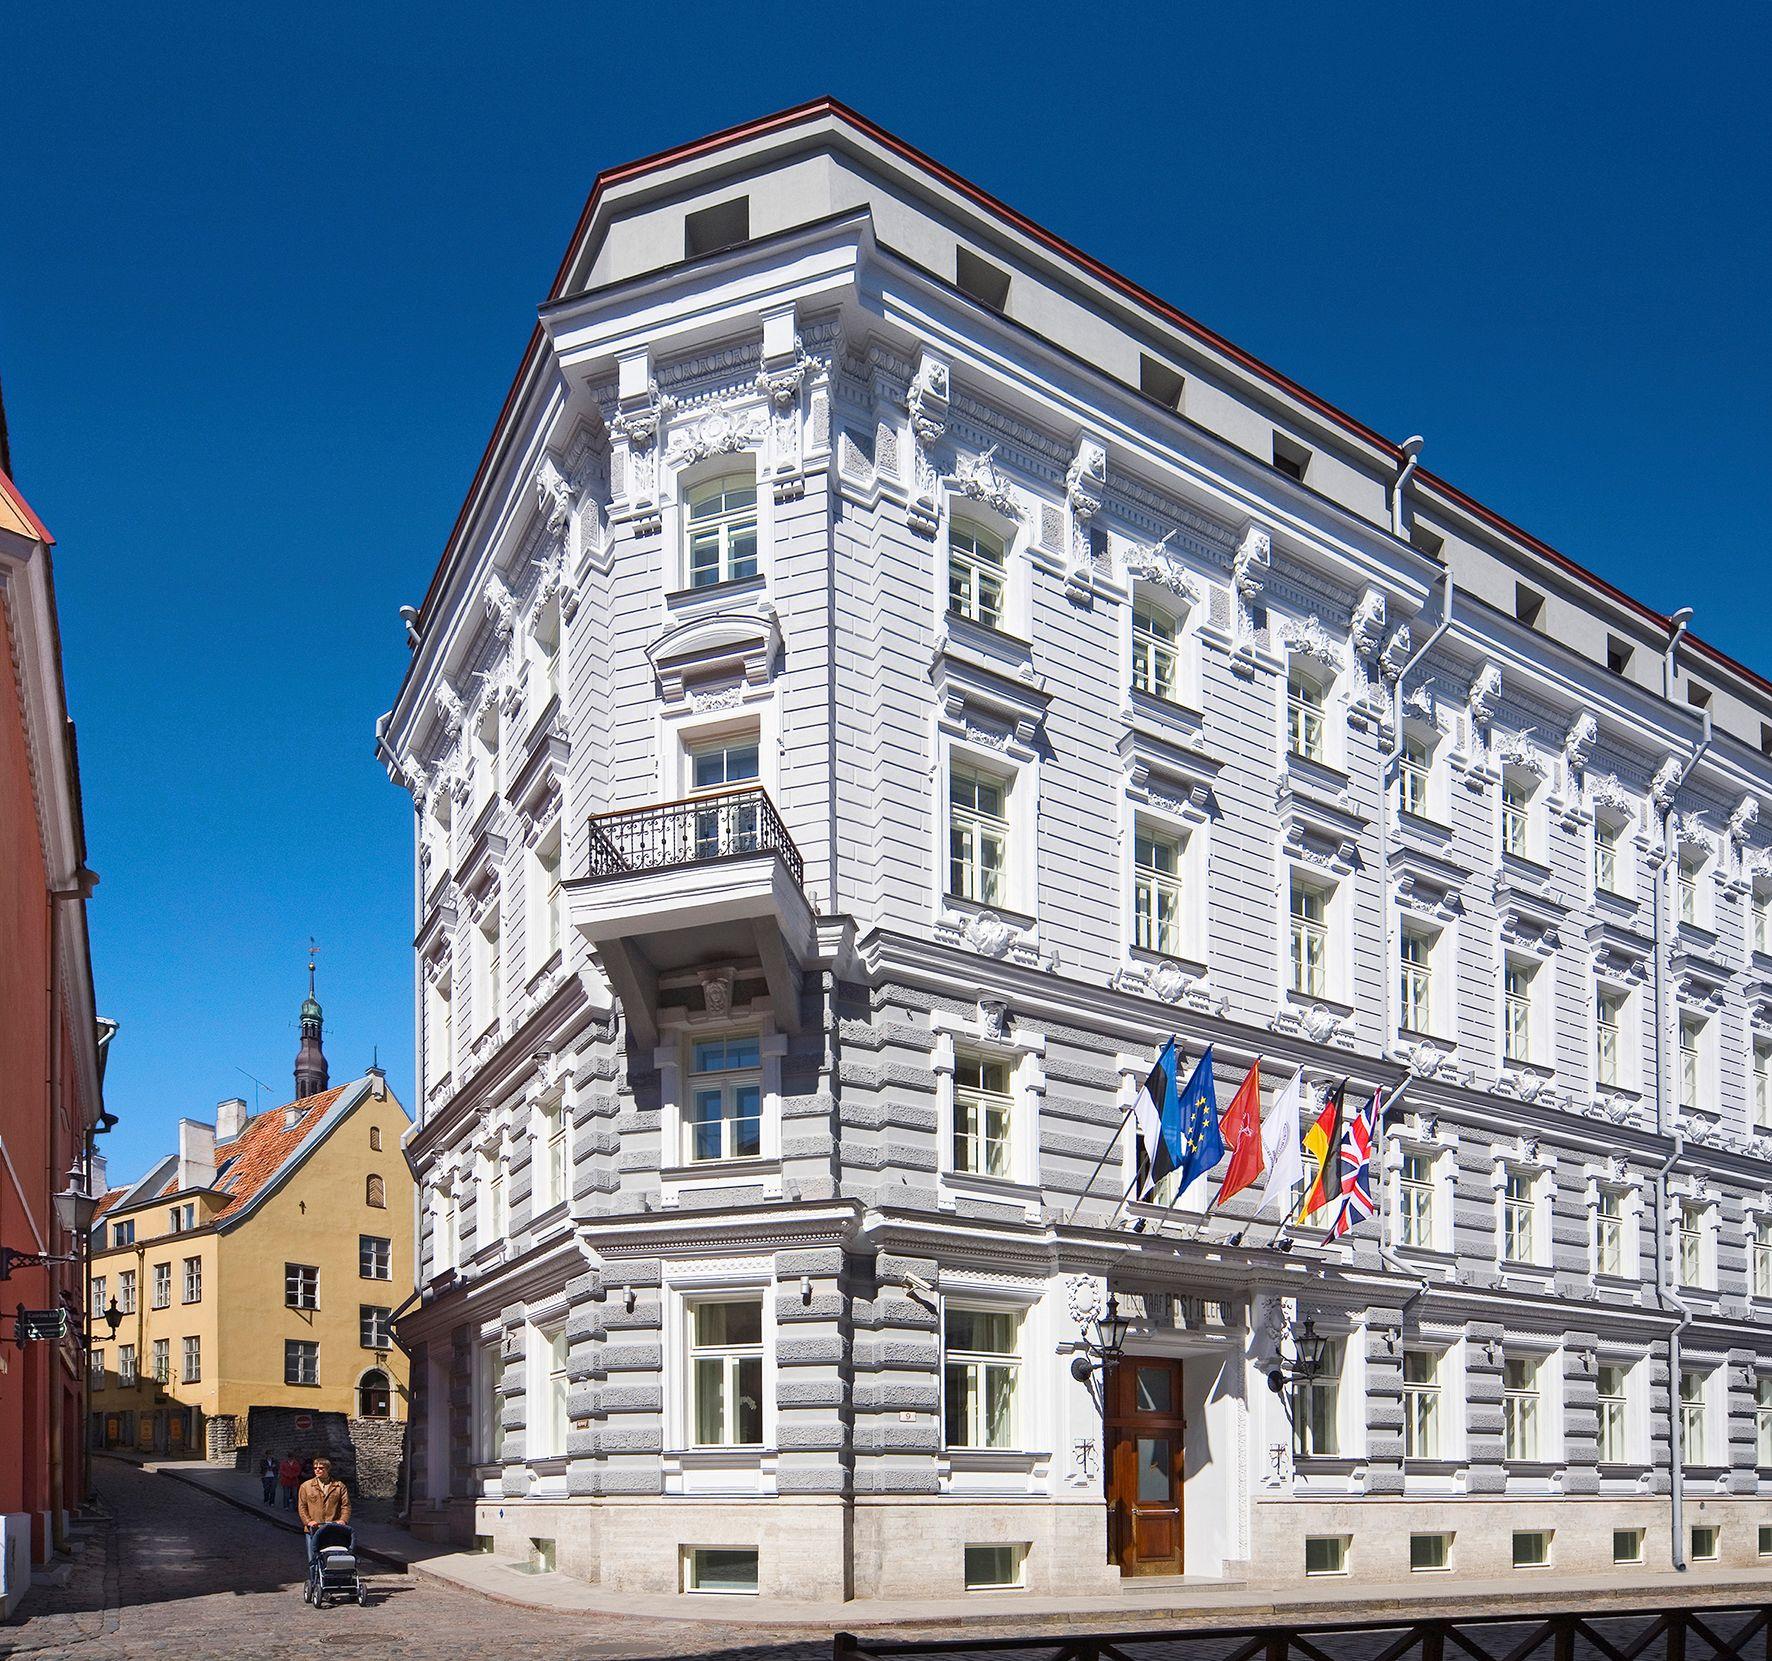 Hotel telegraaf tallinn luxury hotel estonia original for Hotel original